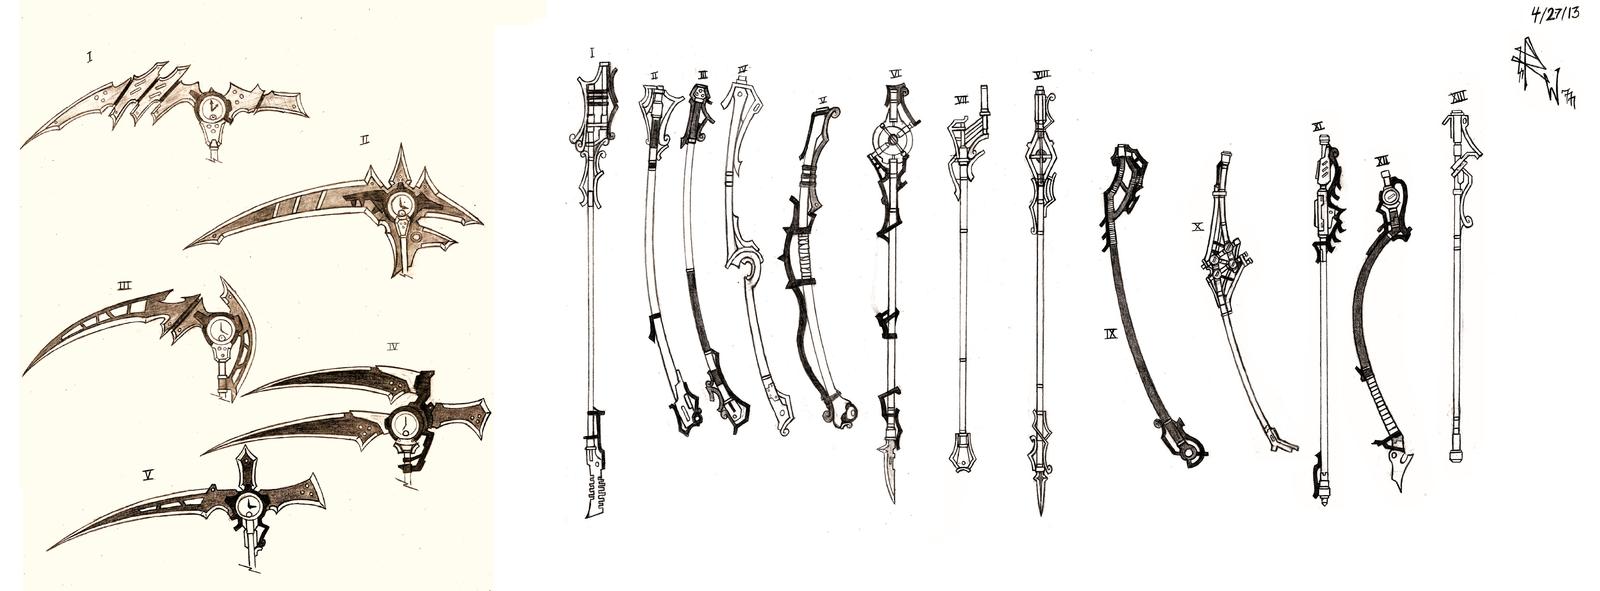 Drawn scythe sci fi Pole Handle 59 fi Armory